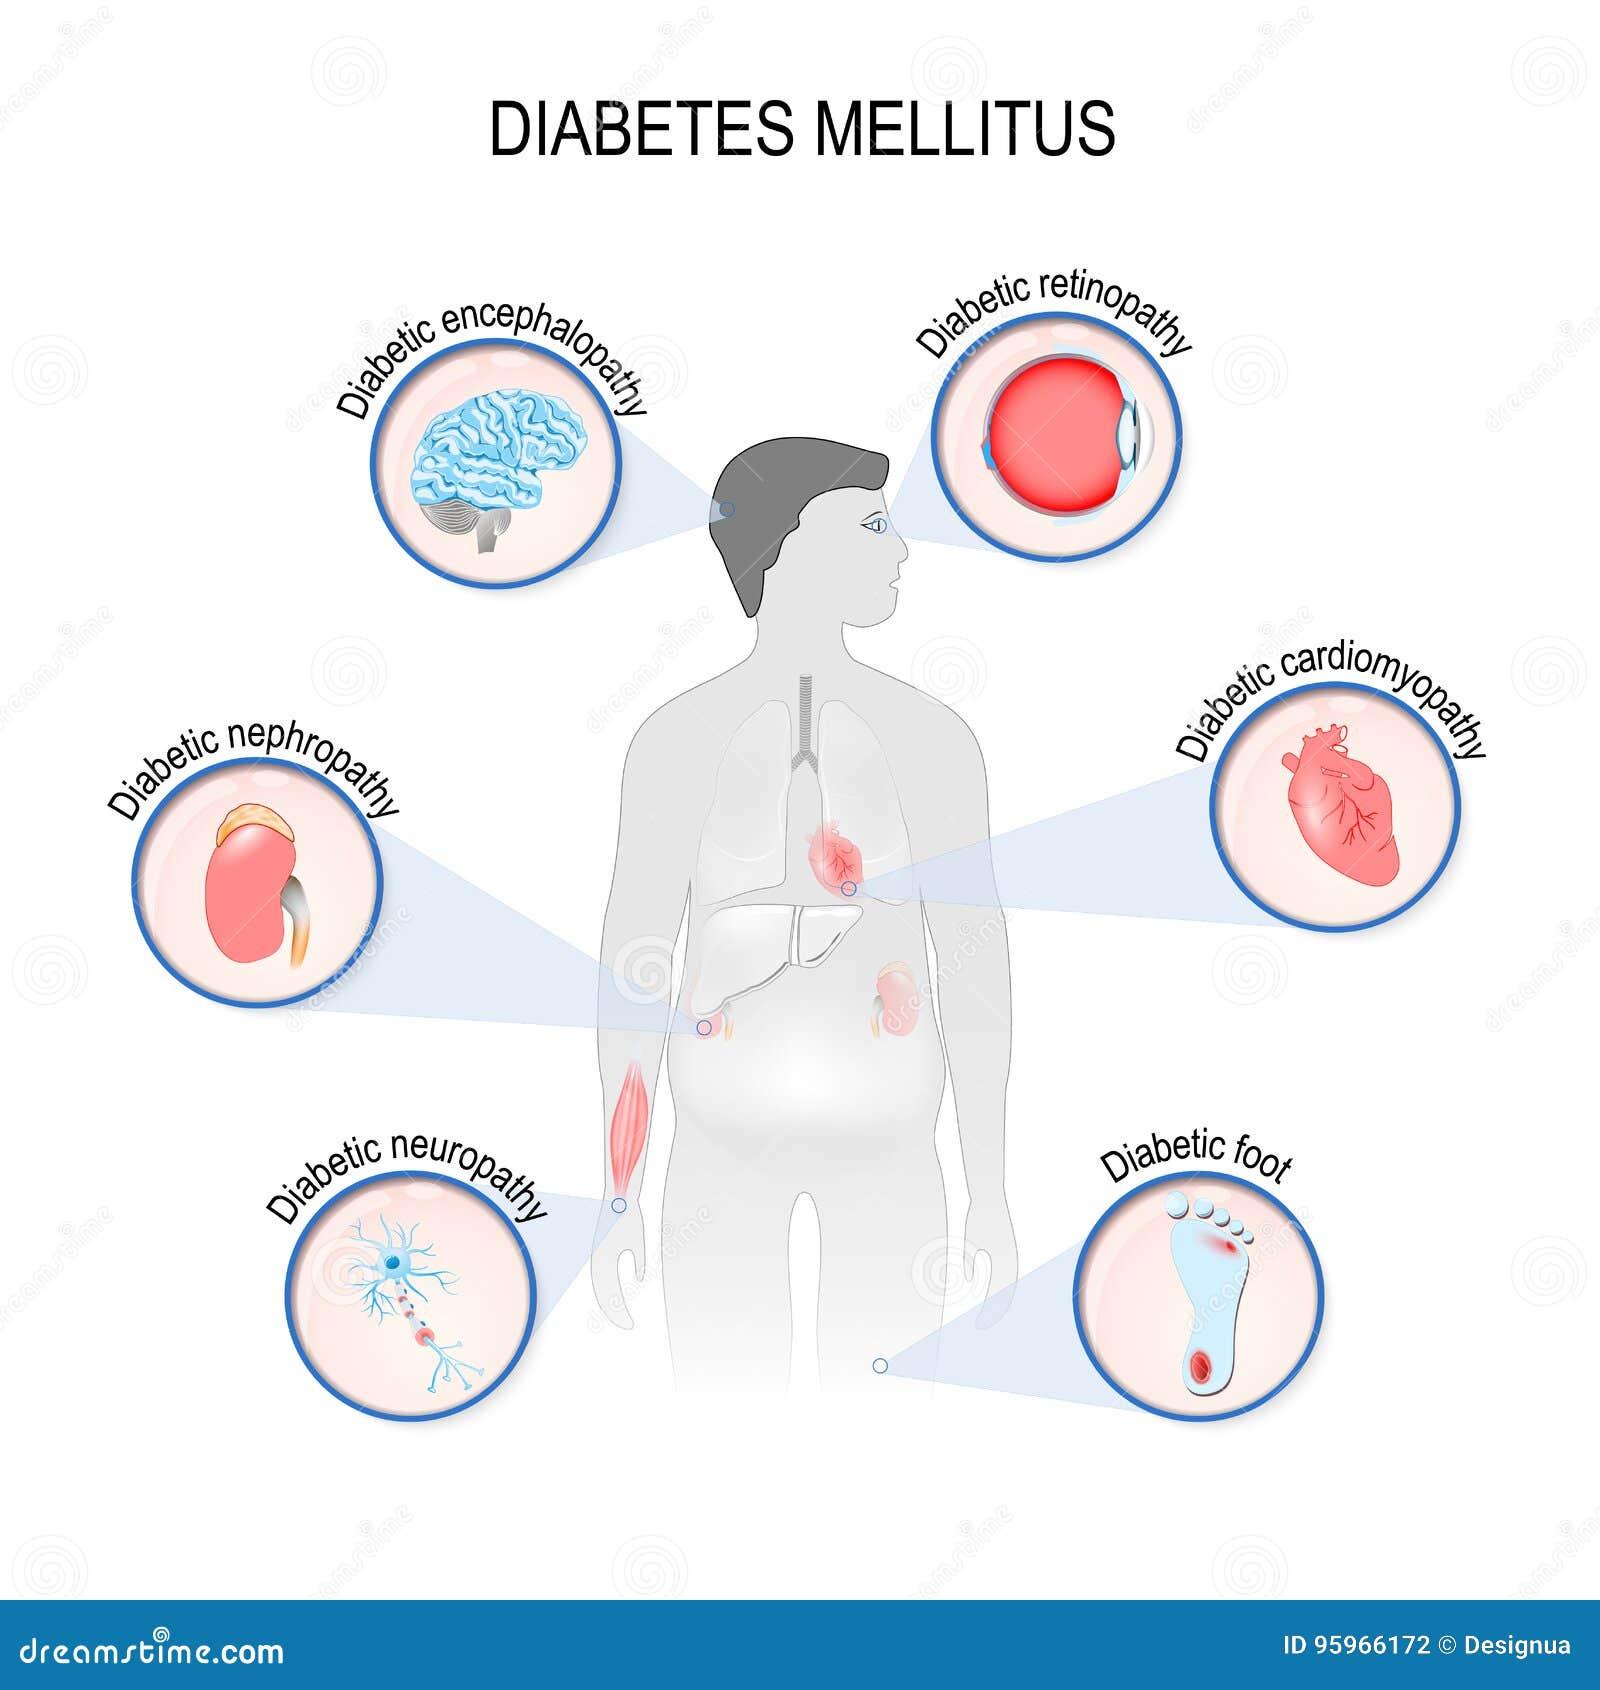 Diabetes mellitus akute komplikationen